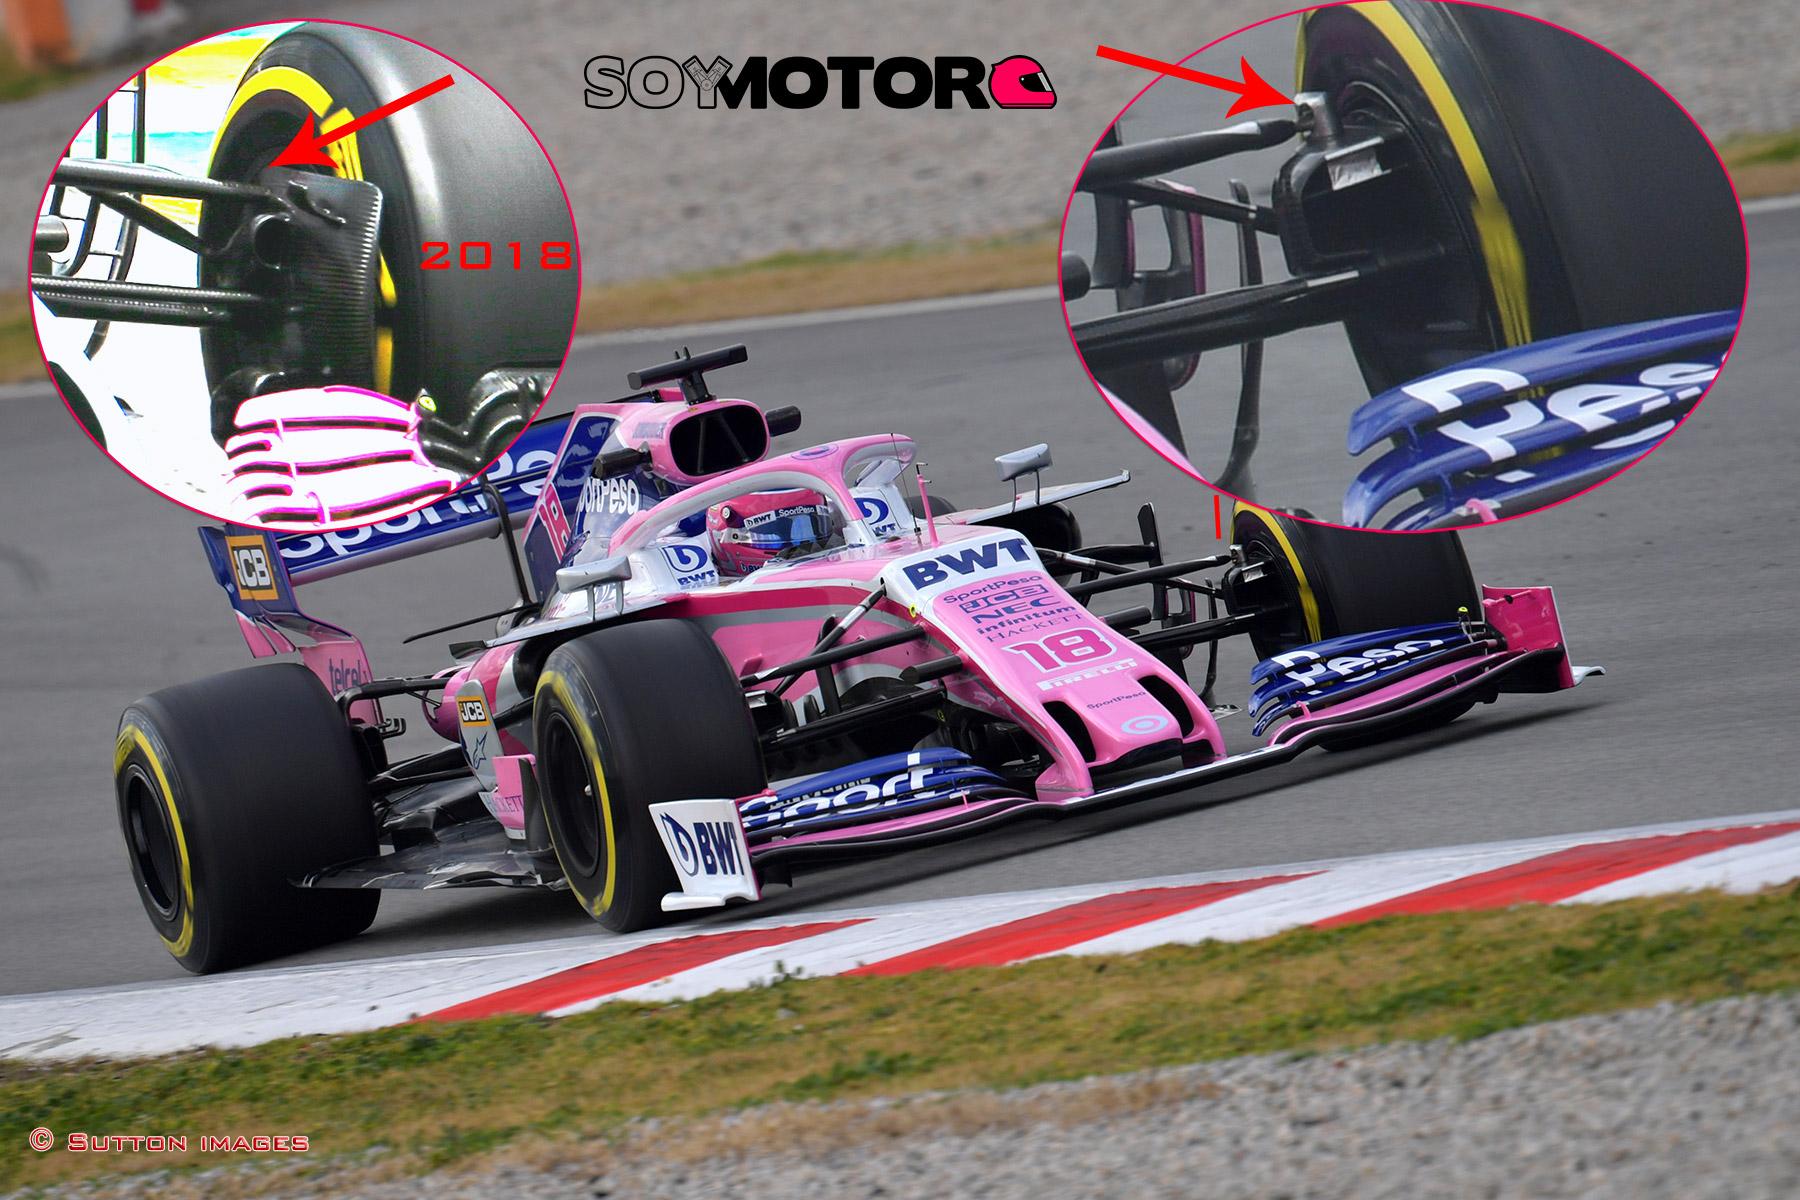 rp19-suspension-delantera.jpg